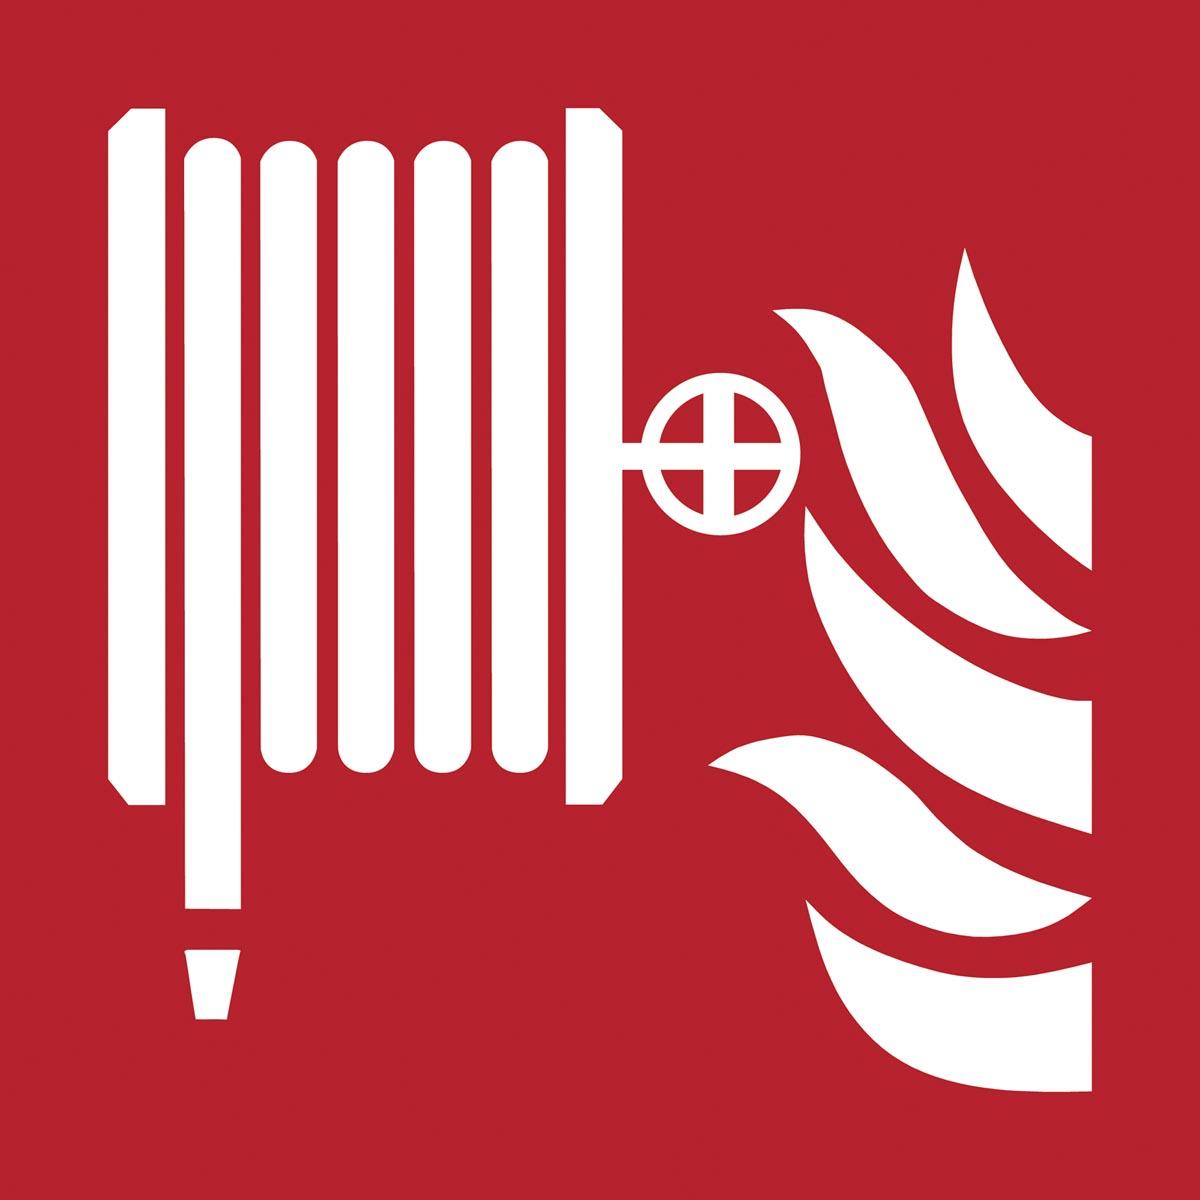 Tarifold brandveiligheidsbord uit PP, brandhaspel met vlammen, ft 20 x 20 cm